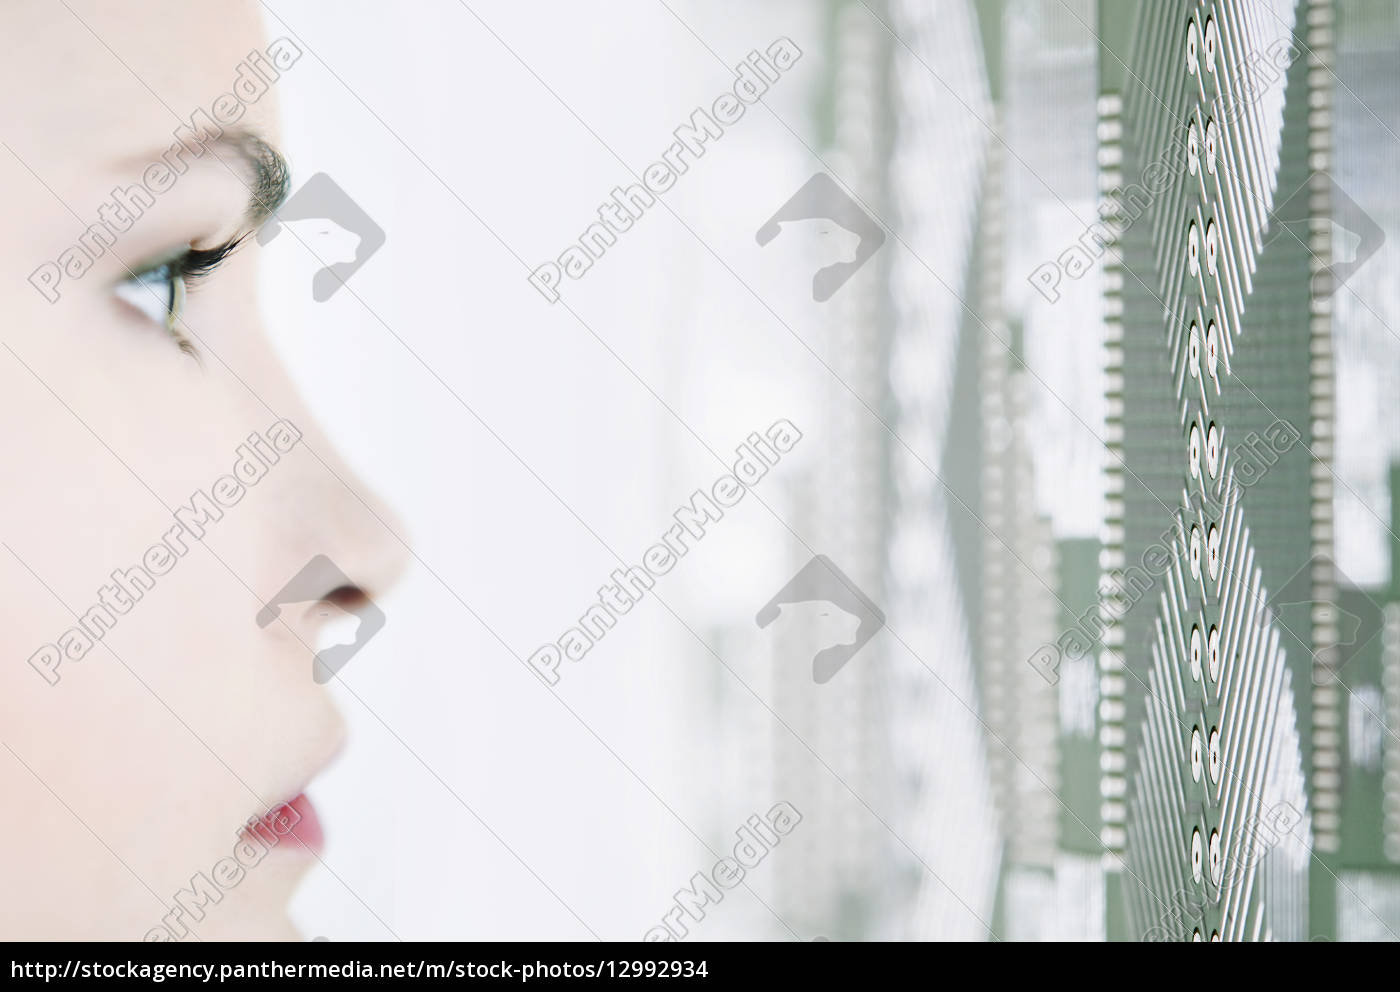 makro, grossaufnahme, macro, makroaufnahme, macroaufnahme, nahaufnahme - 12992934